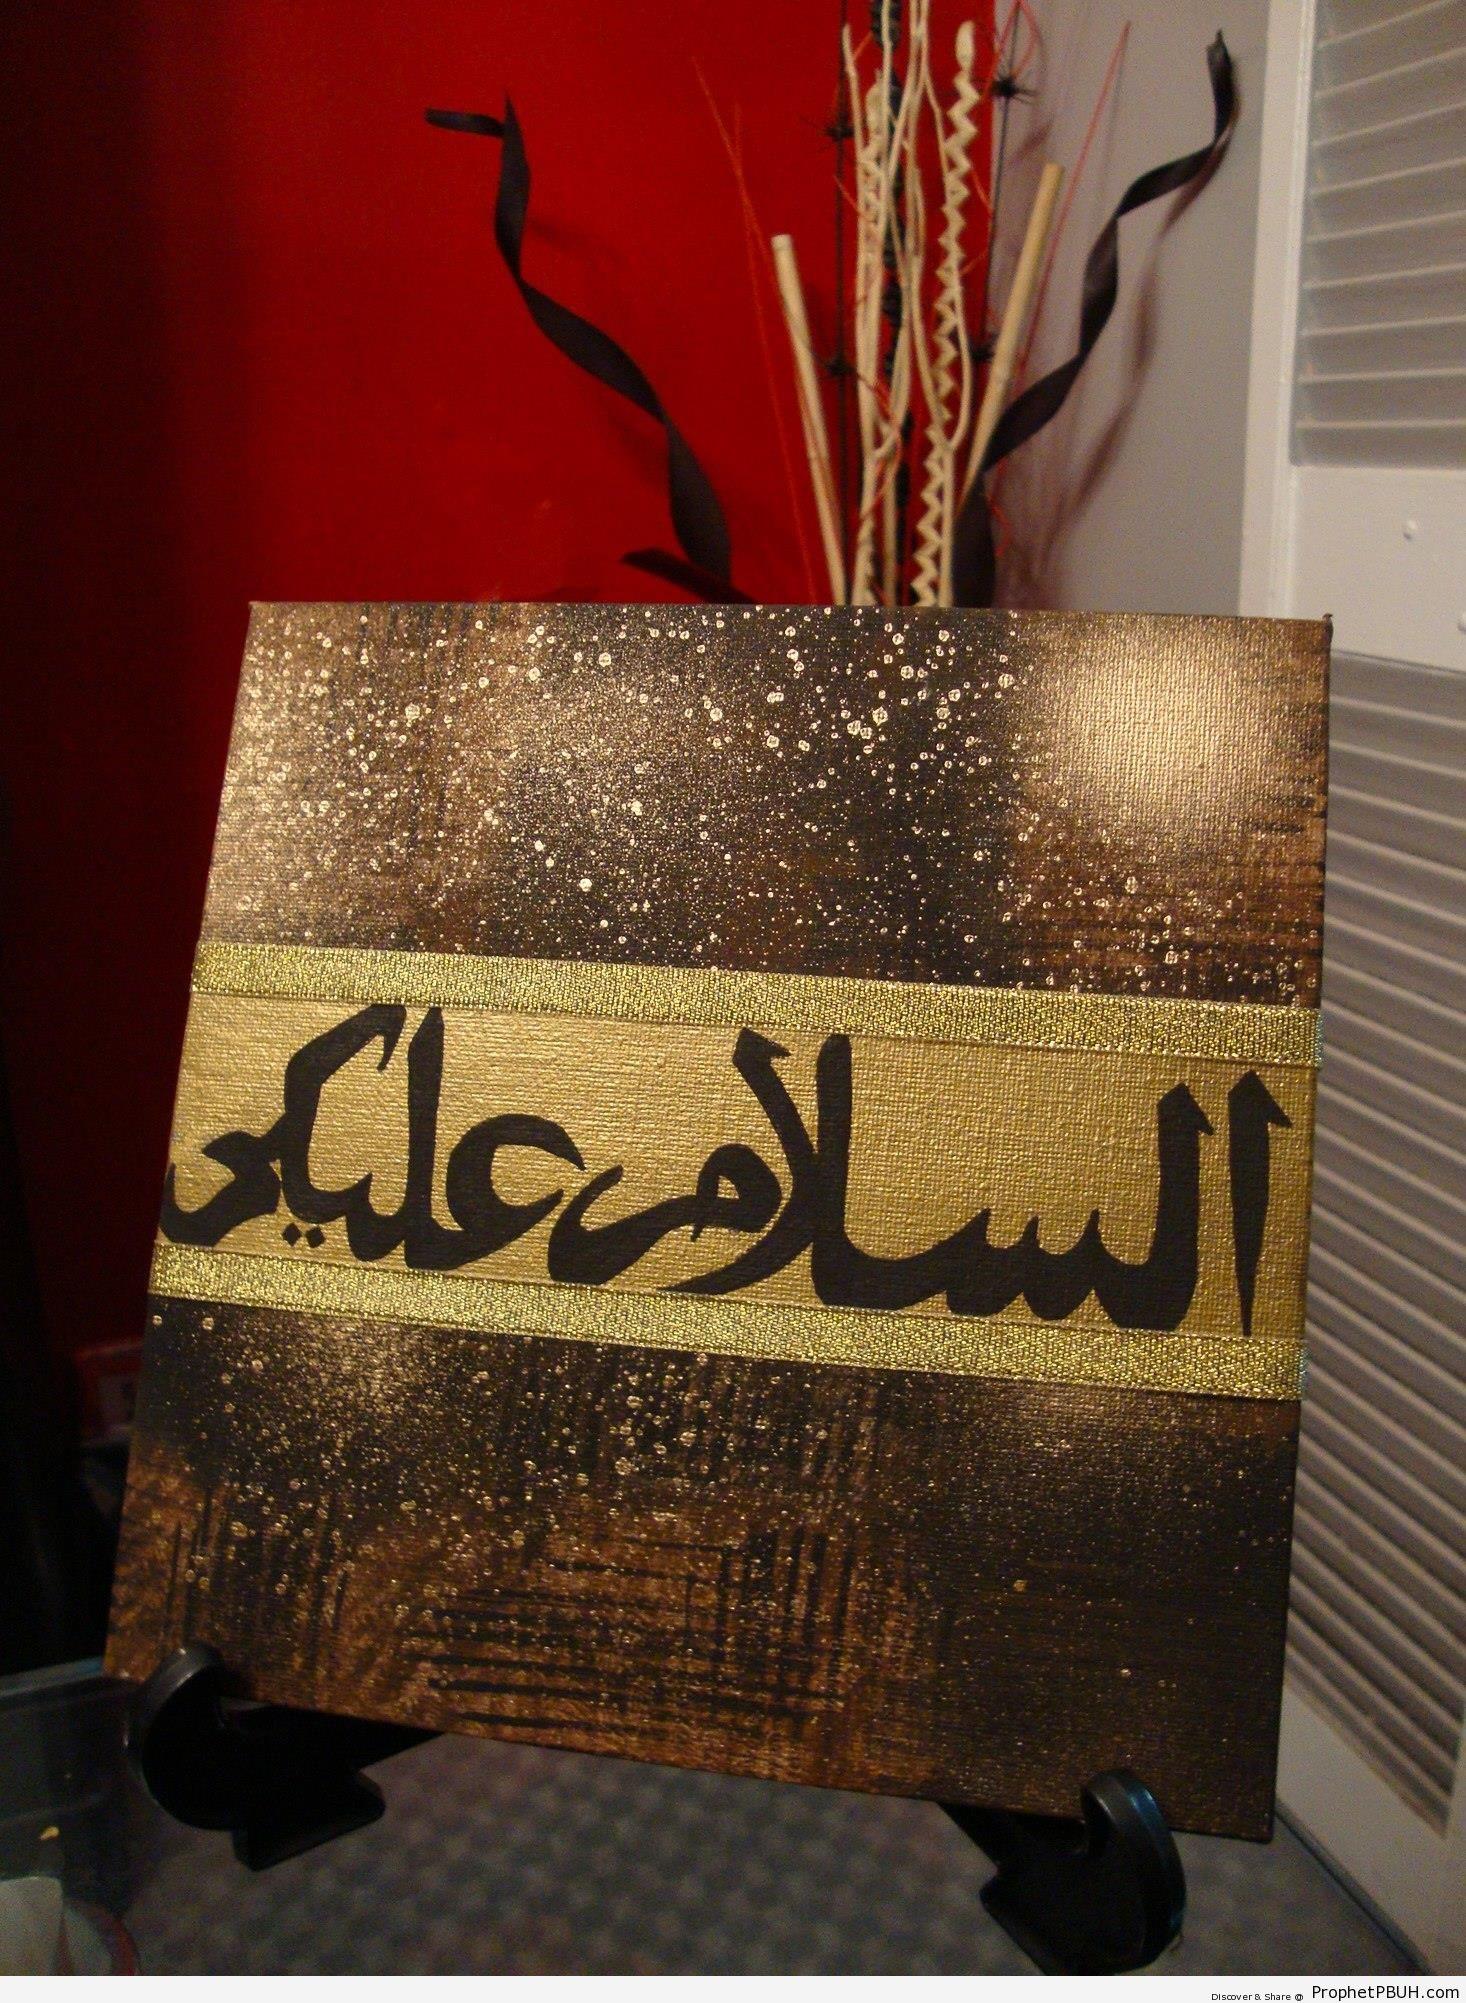 As-Salamu Alaikum (Peace Be With You) Arabic Calligraphy - Artist- Saleha Patel